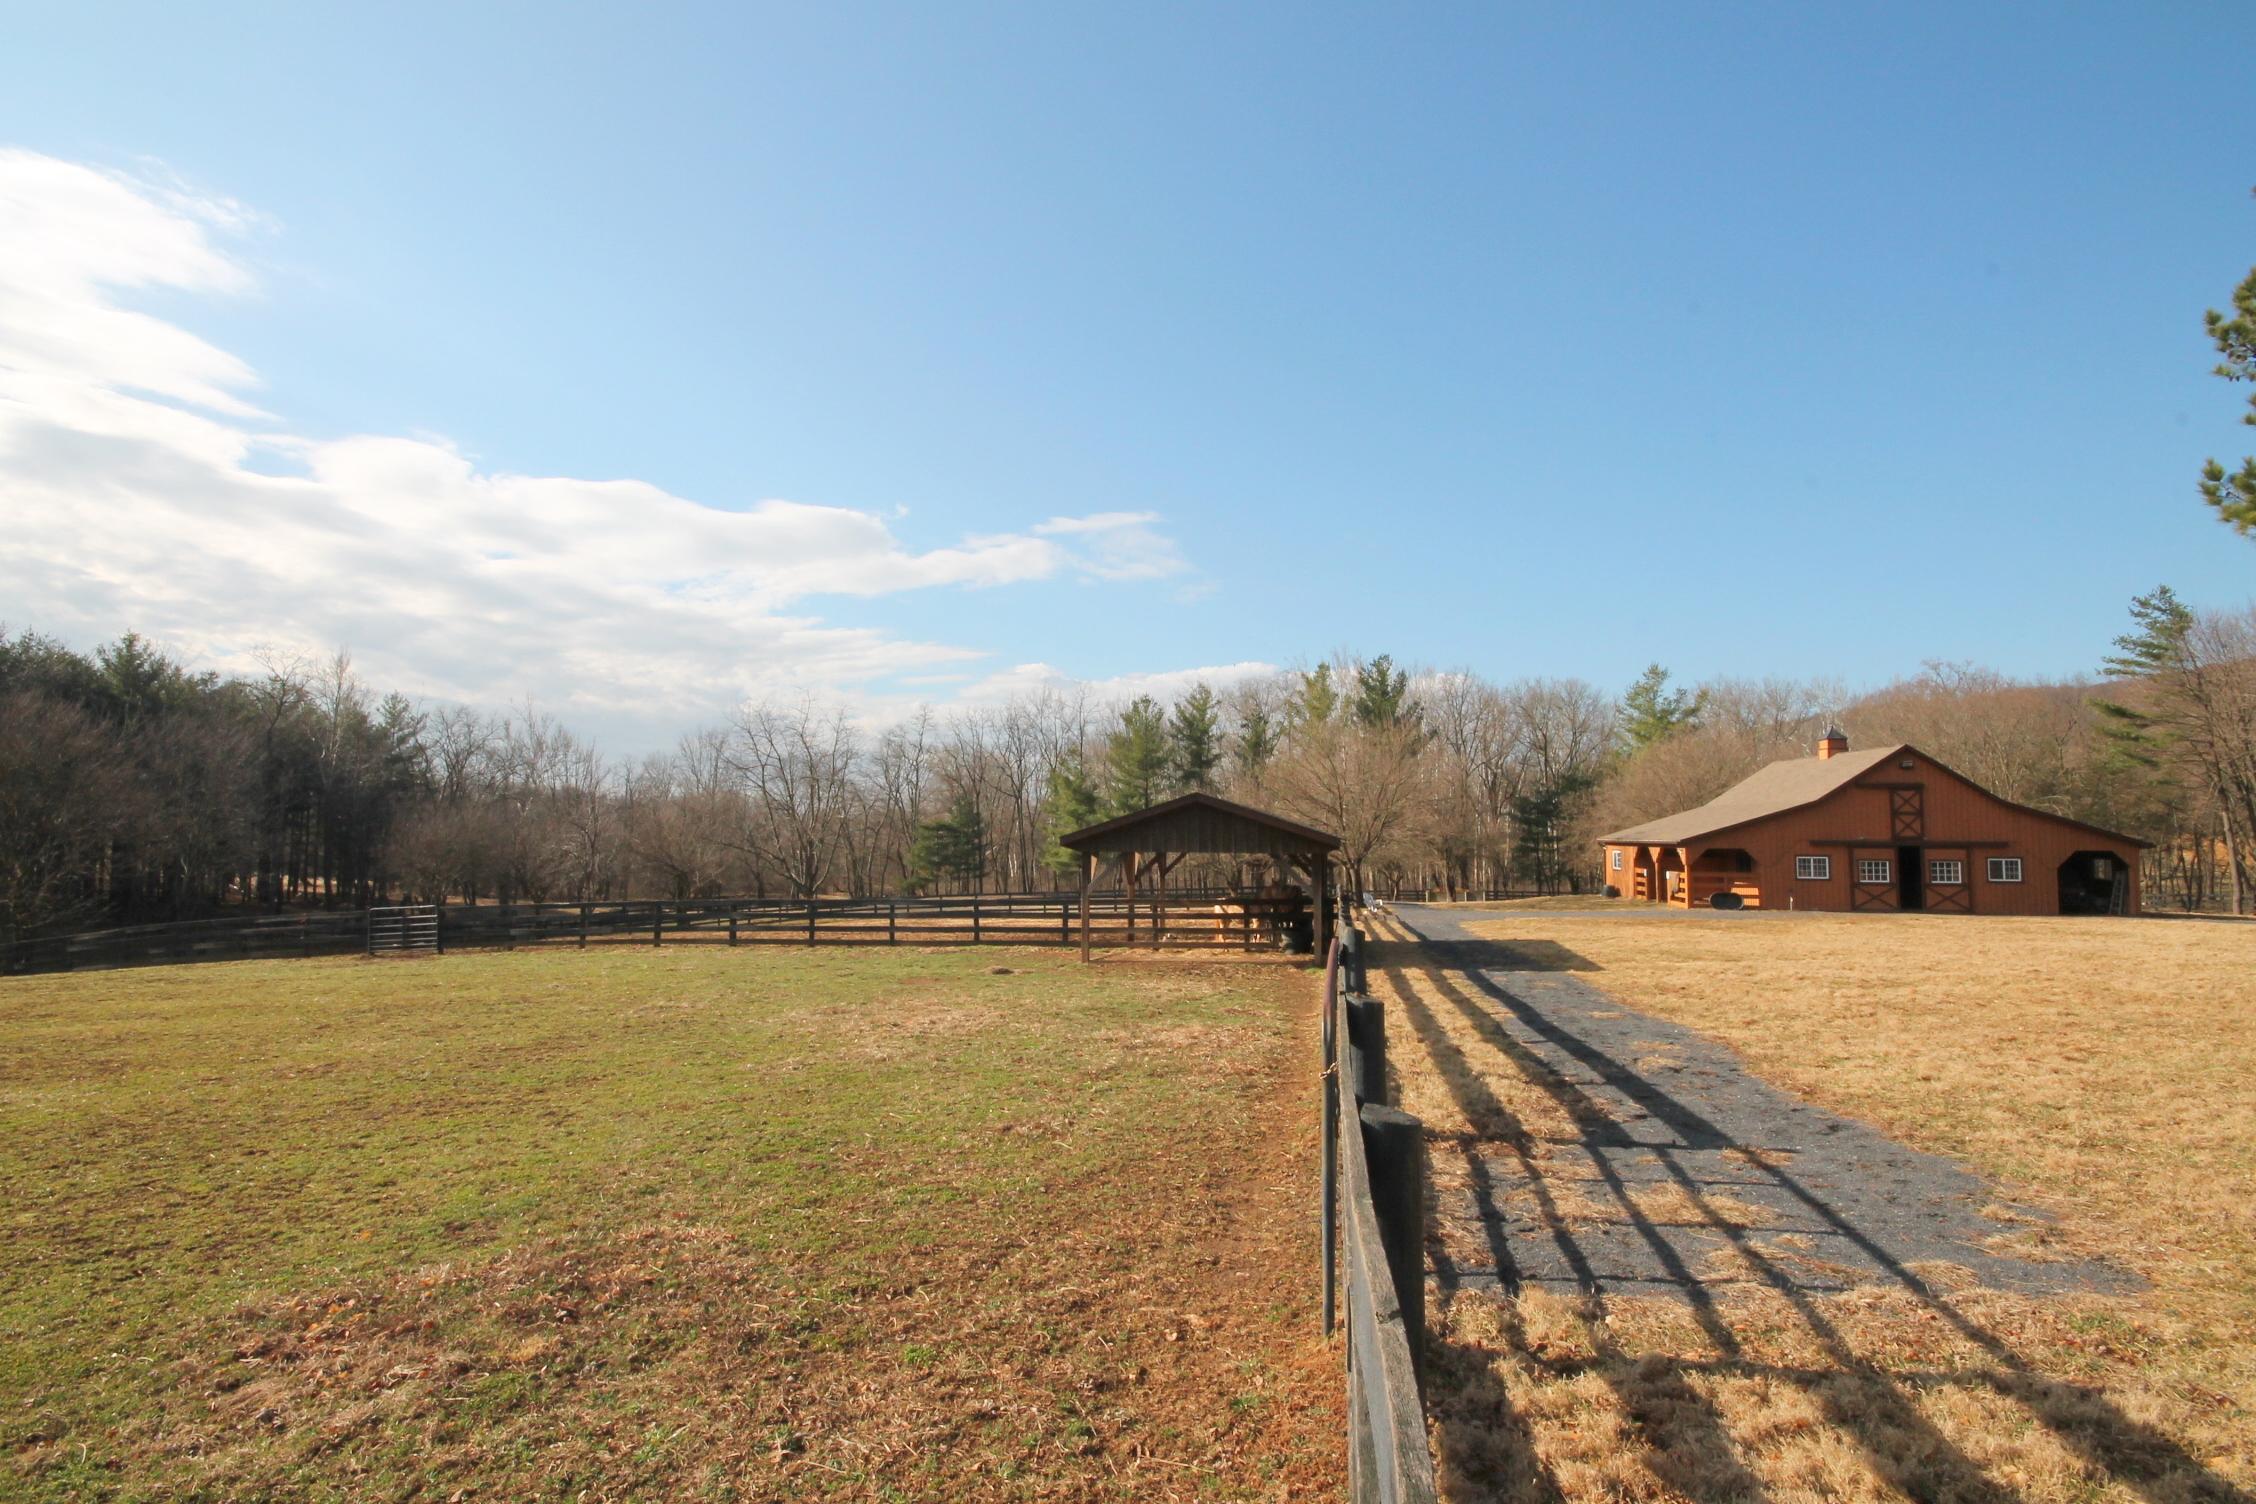 Homes in Northern Virginia